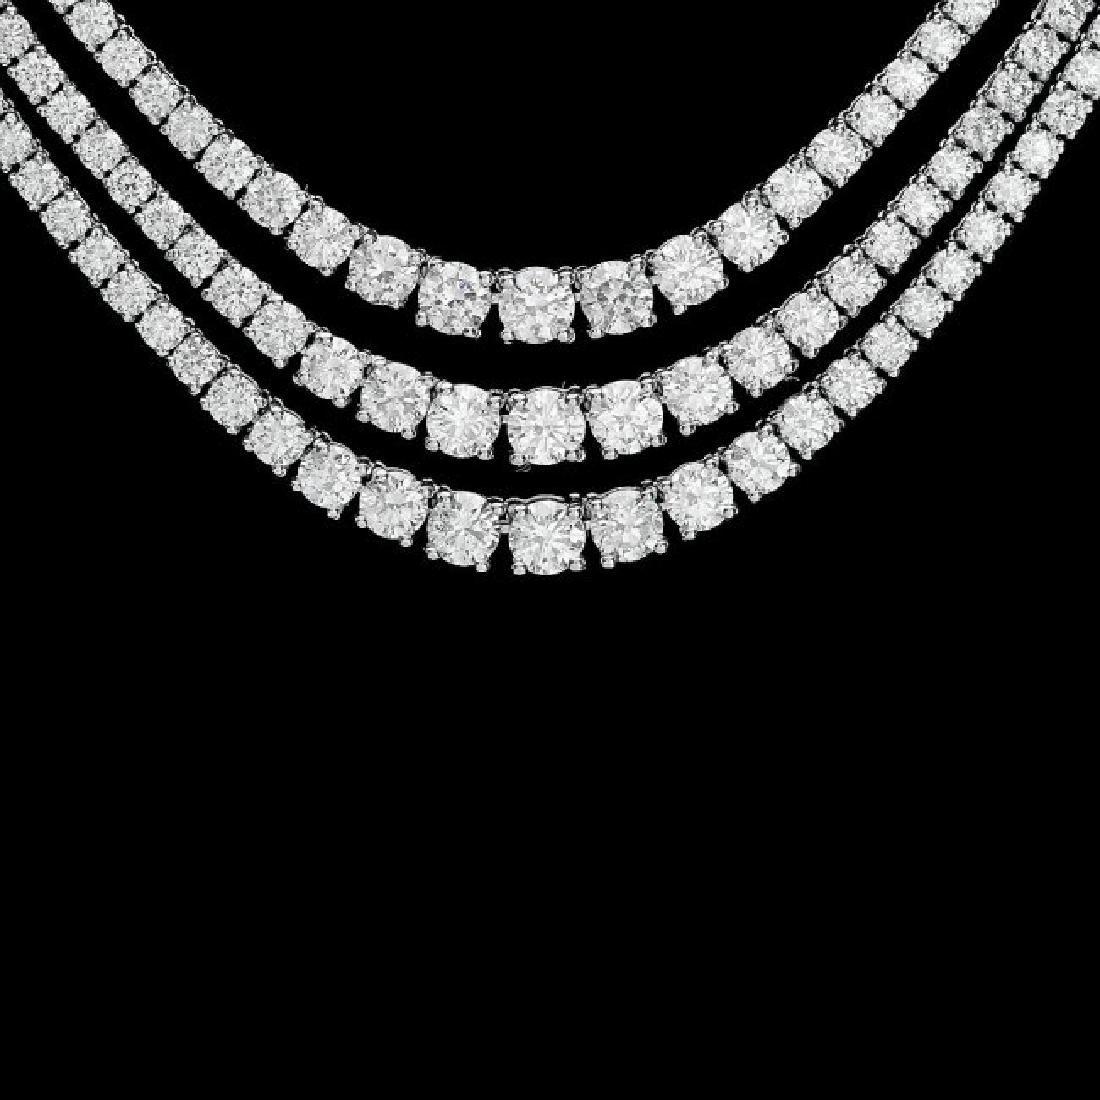 18k White Gold 23.10ct Diamond Necklace - 2